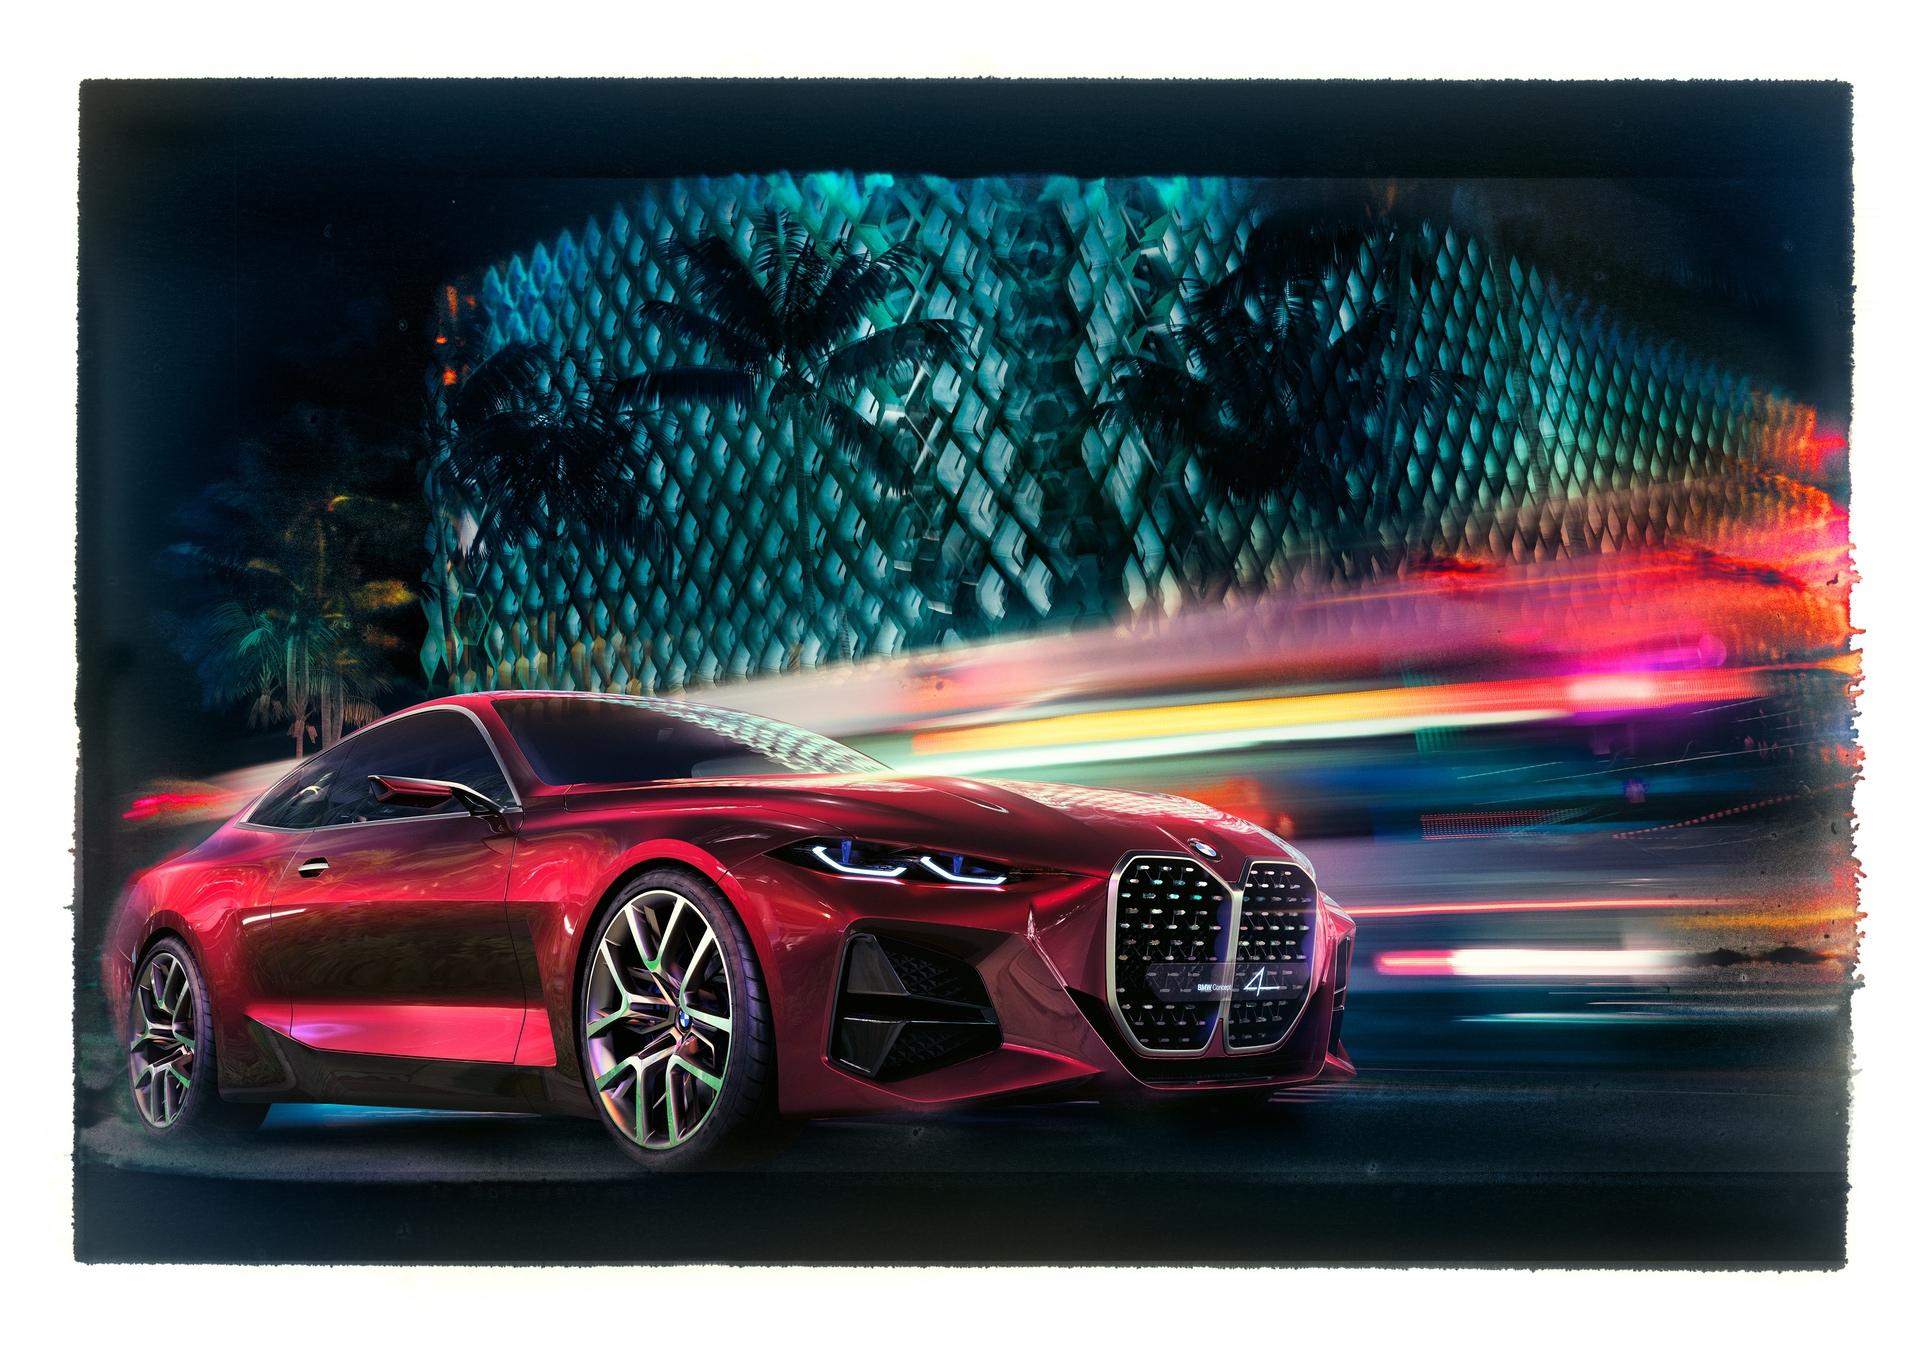 BMW Concept 4 Series images 3